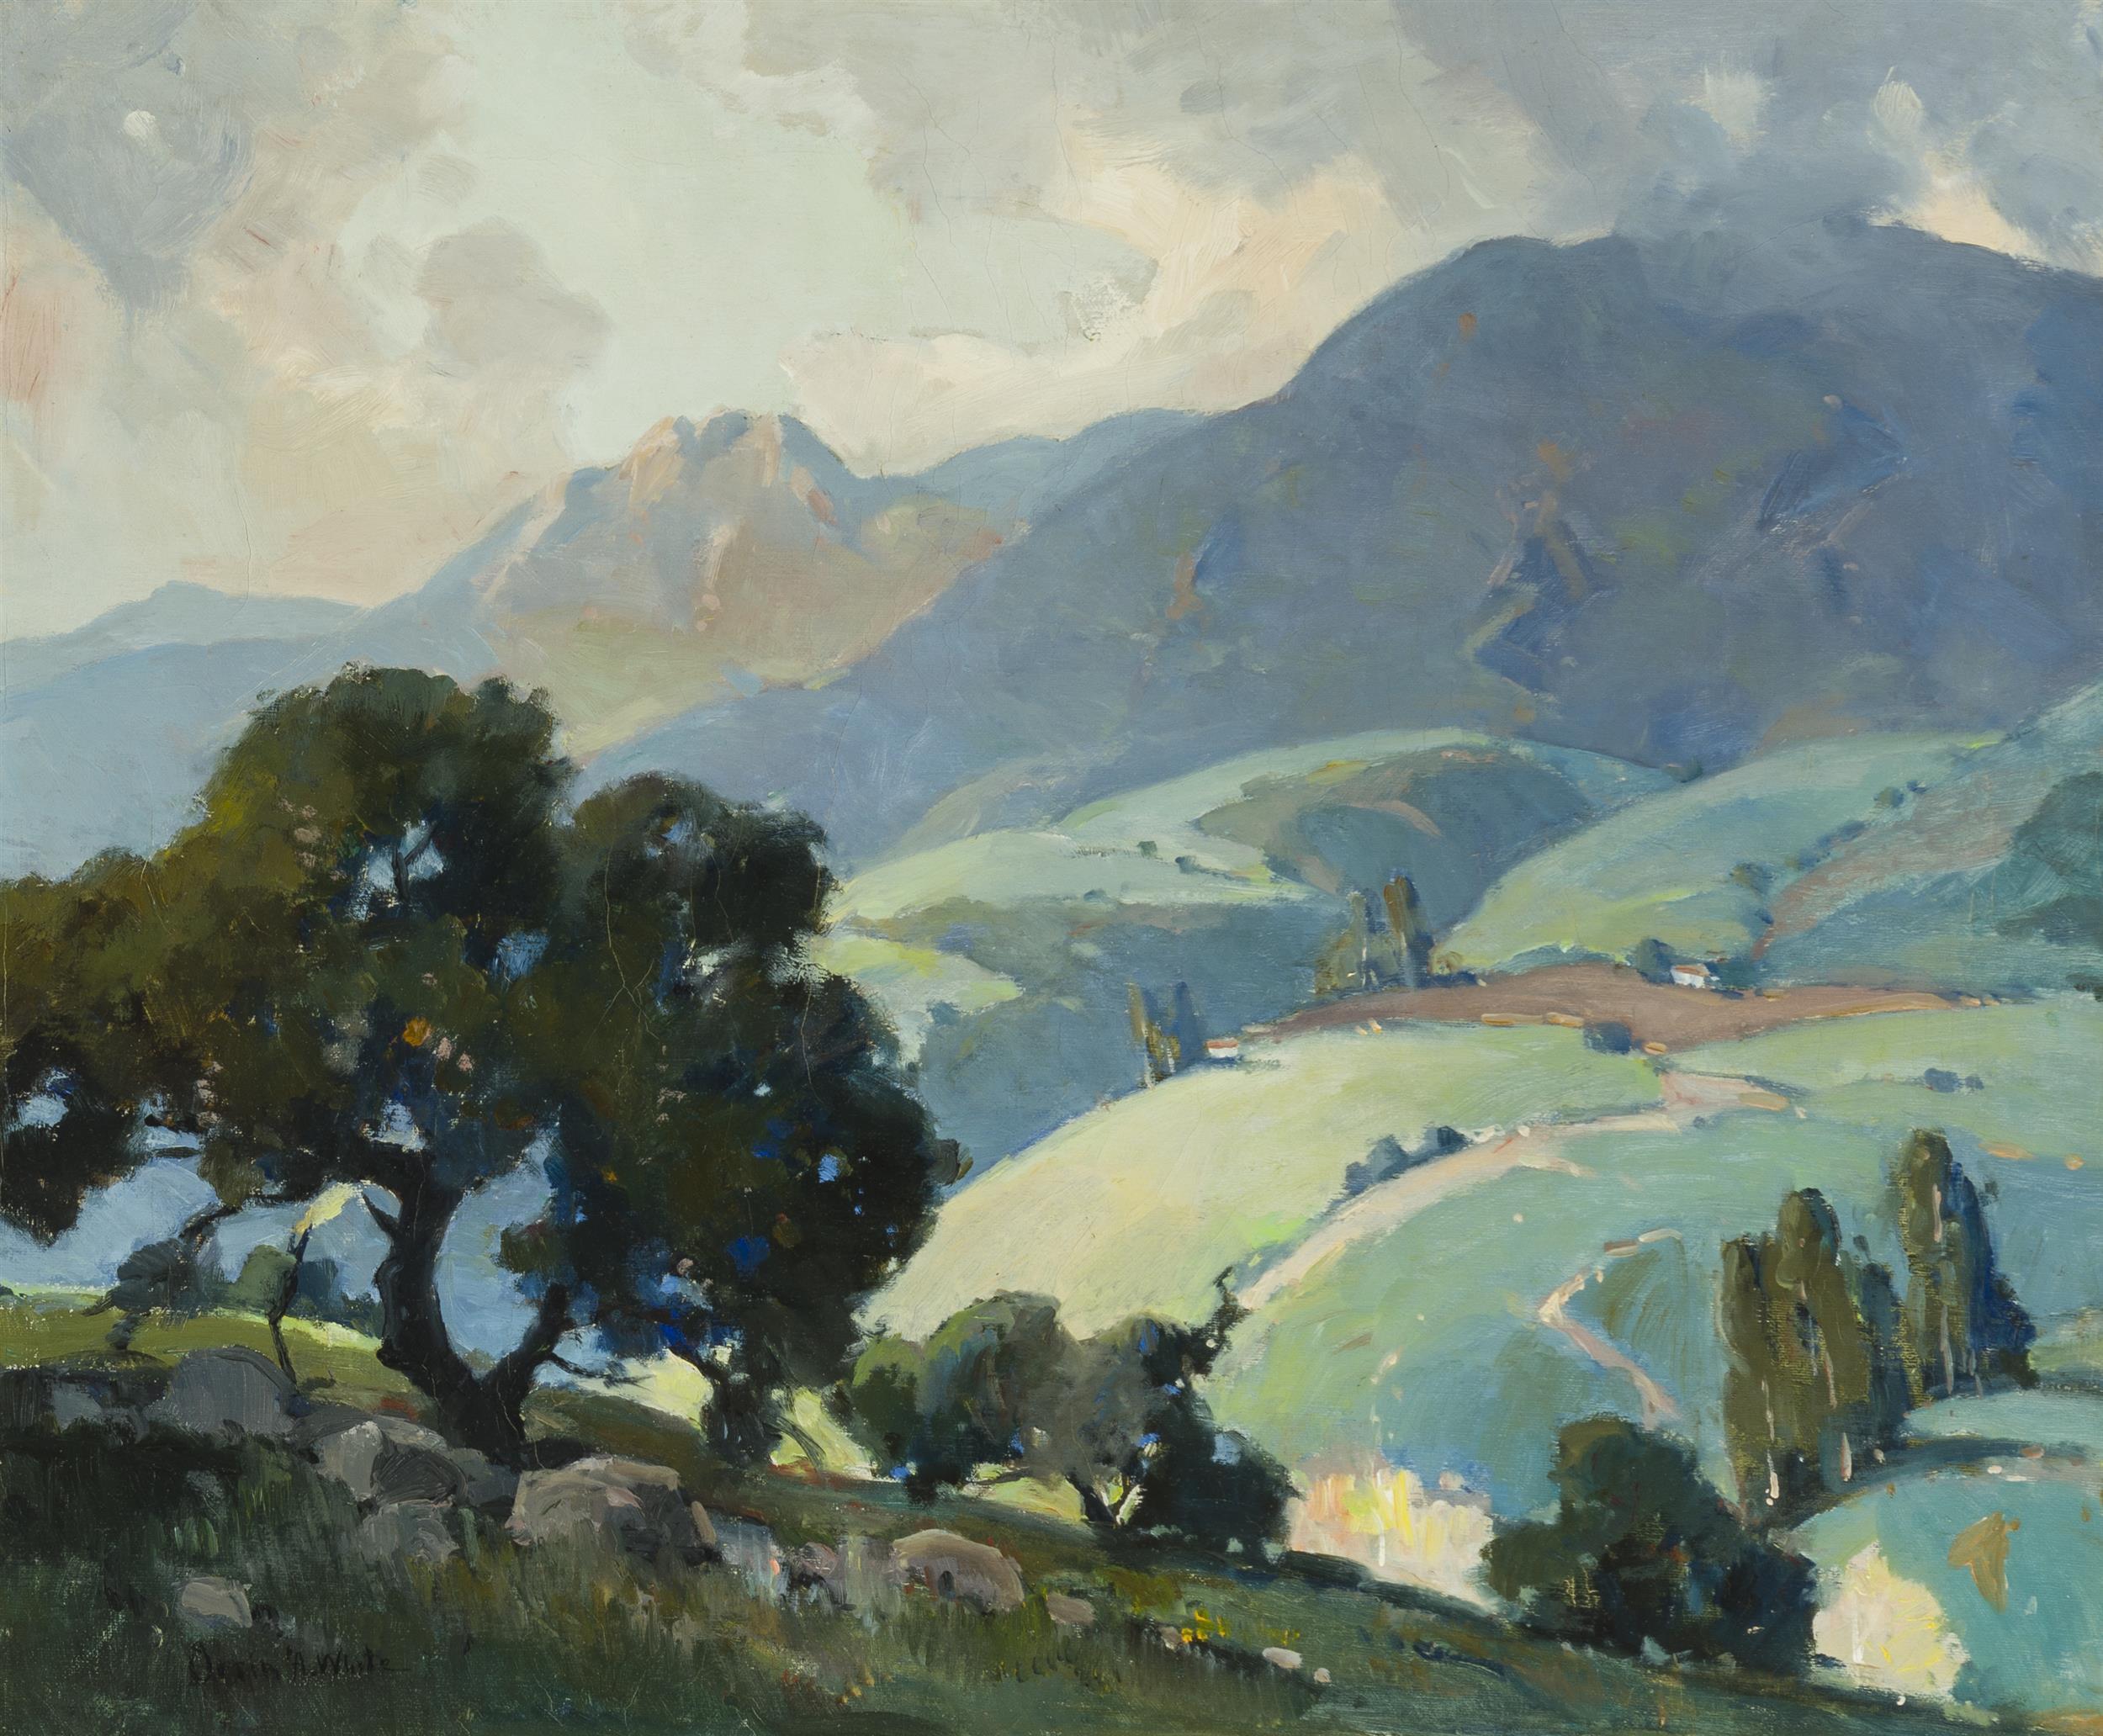 "Orrin A. White, (1883-1969 Pasadena, CA), Santa Barbara mountains landscape, Oil on canvas, 20"" H x 24"" W"